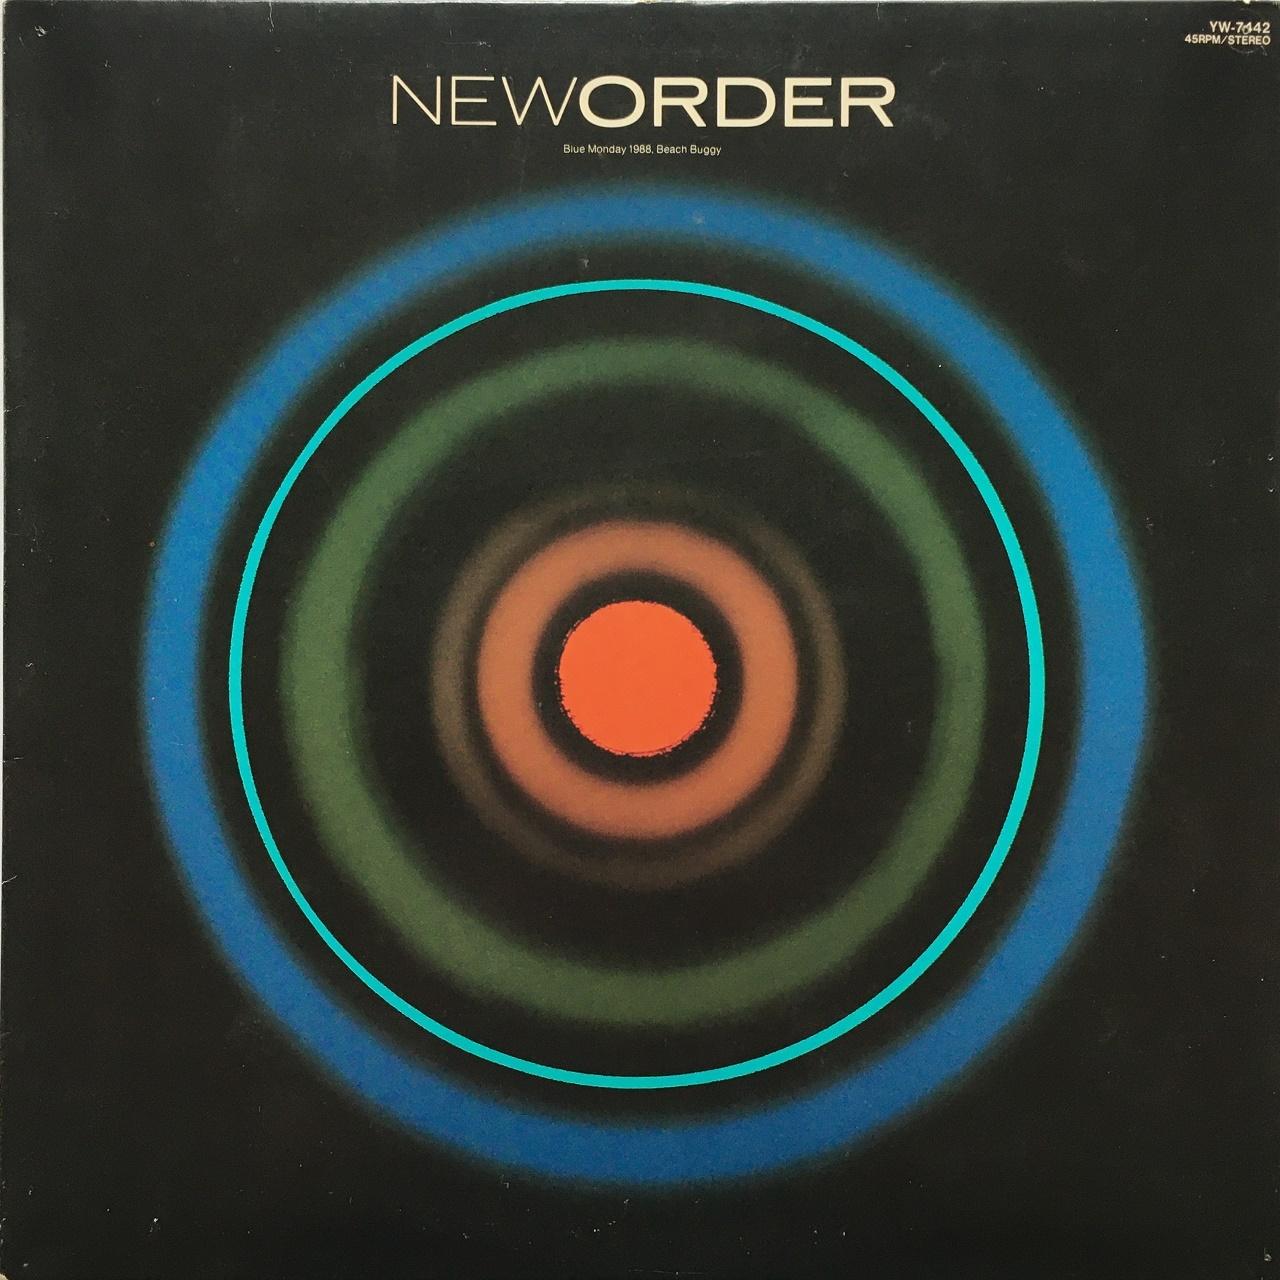 【12inch・国内盤】ニュー・オーダー / ブルー・マンデー 1988